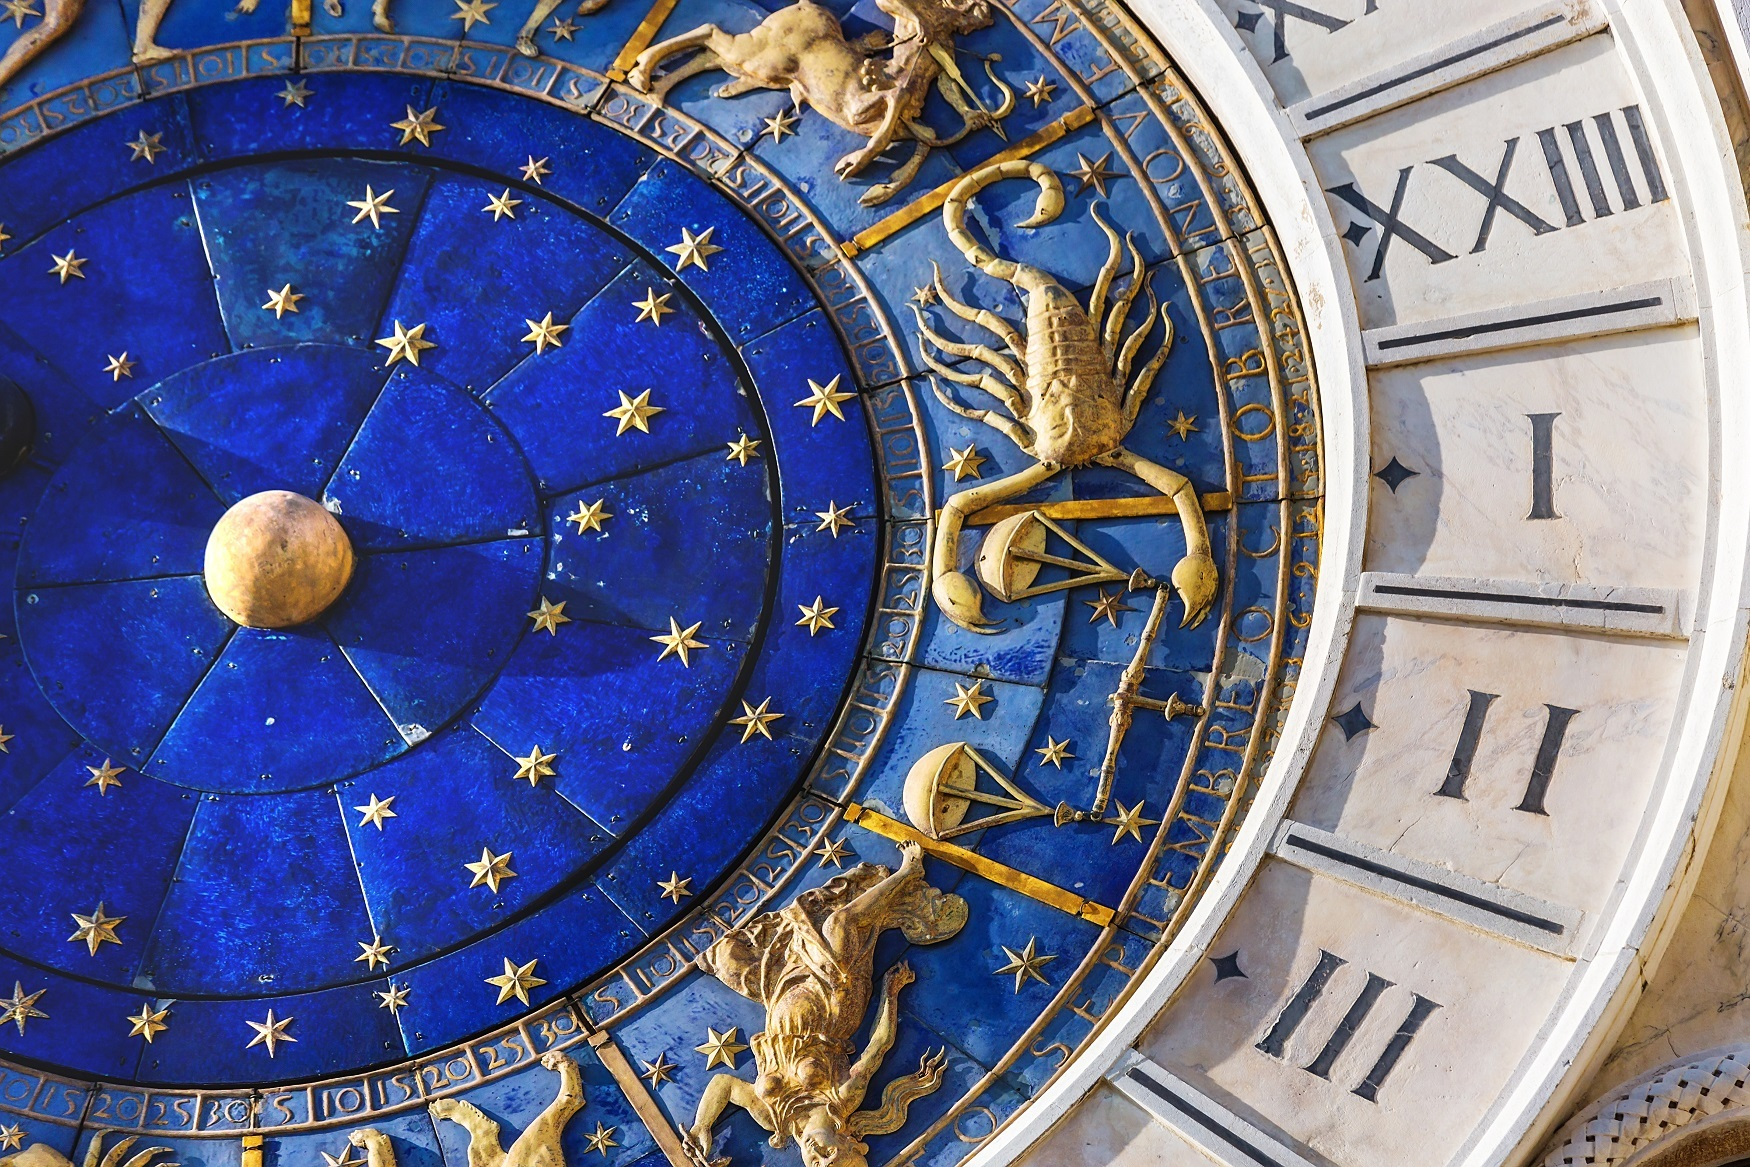 Zodiac signs on clock in Venice Italy